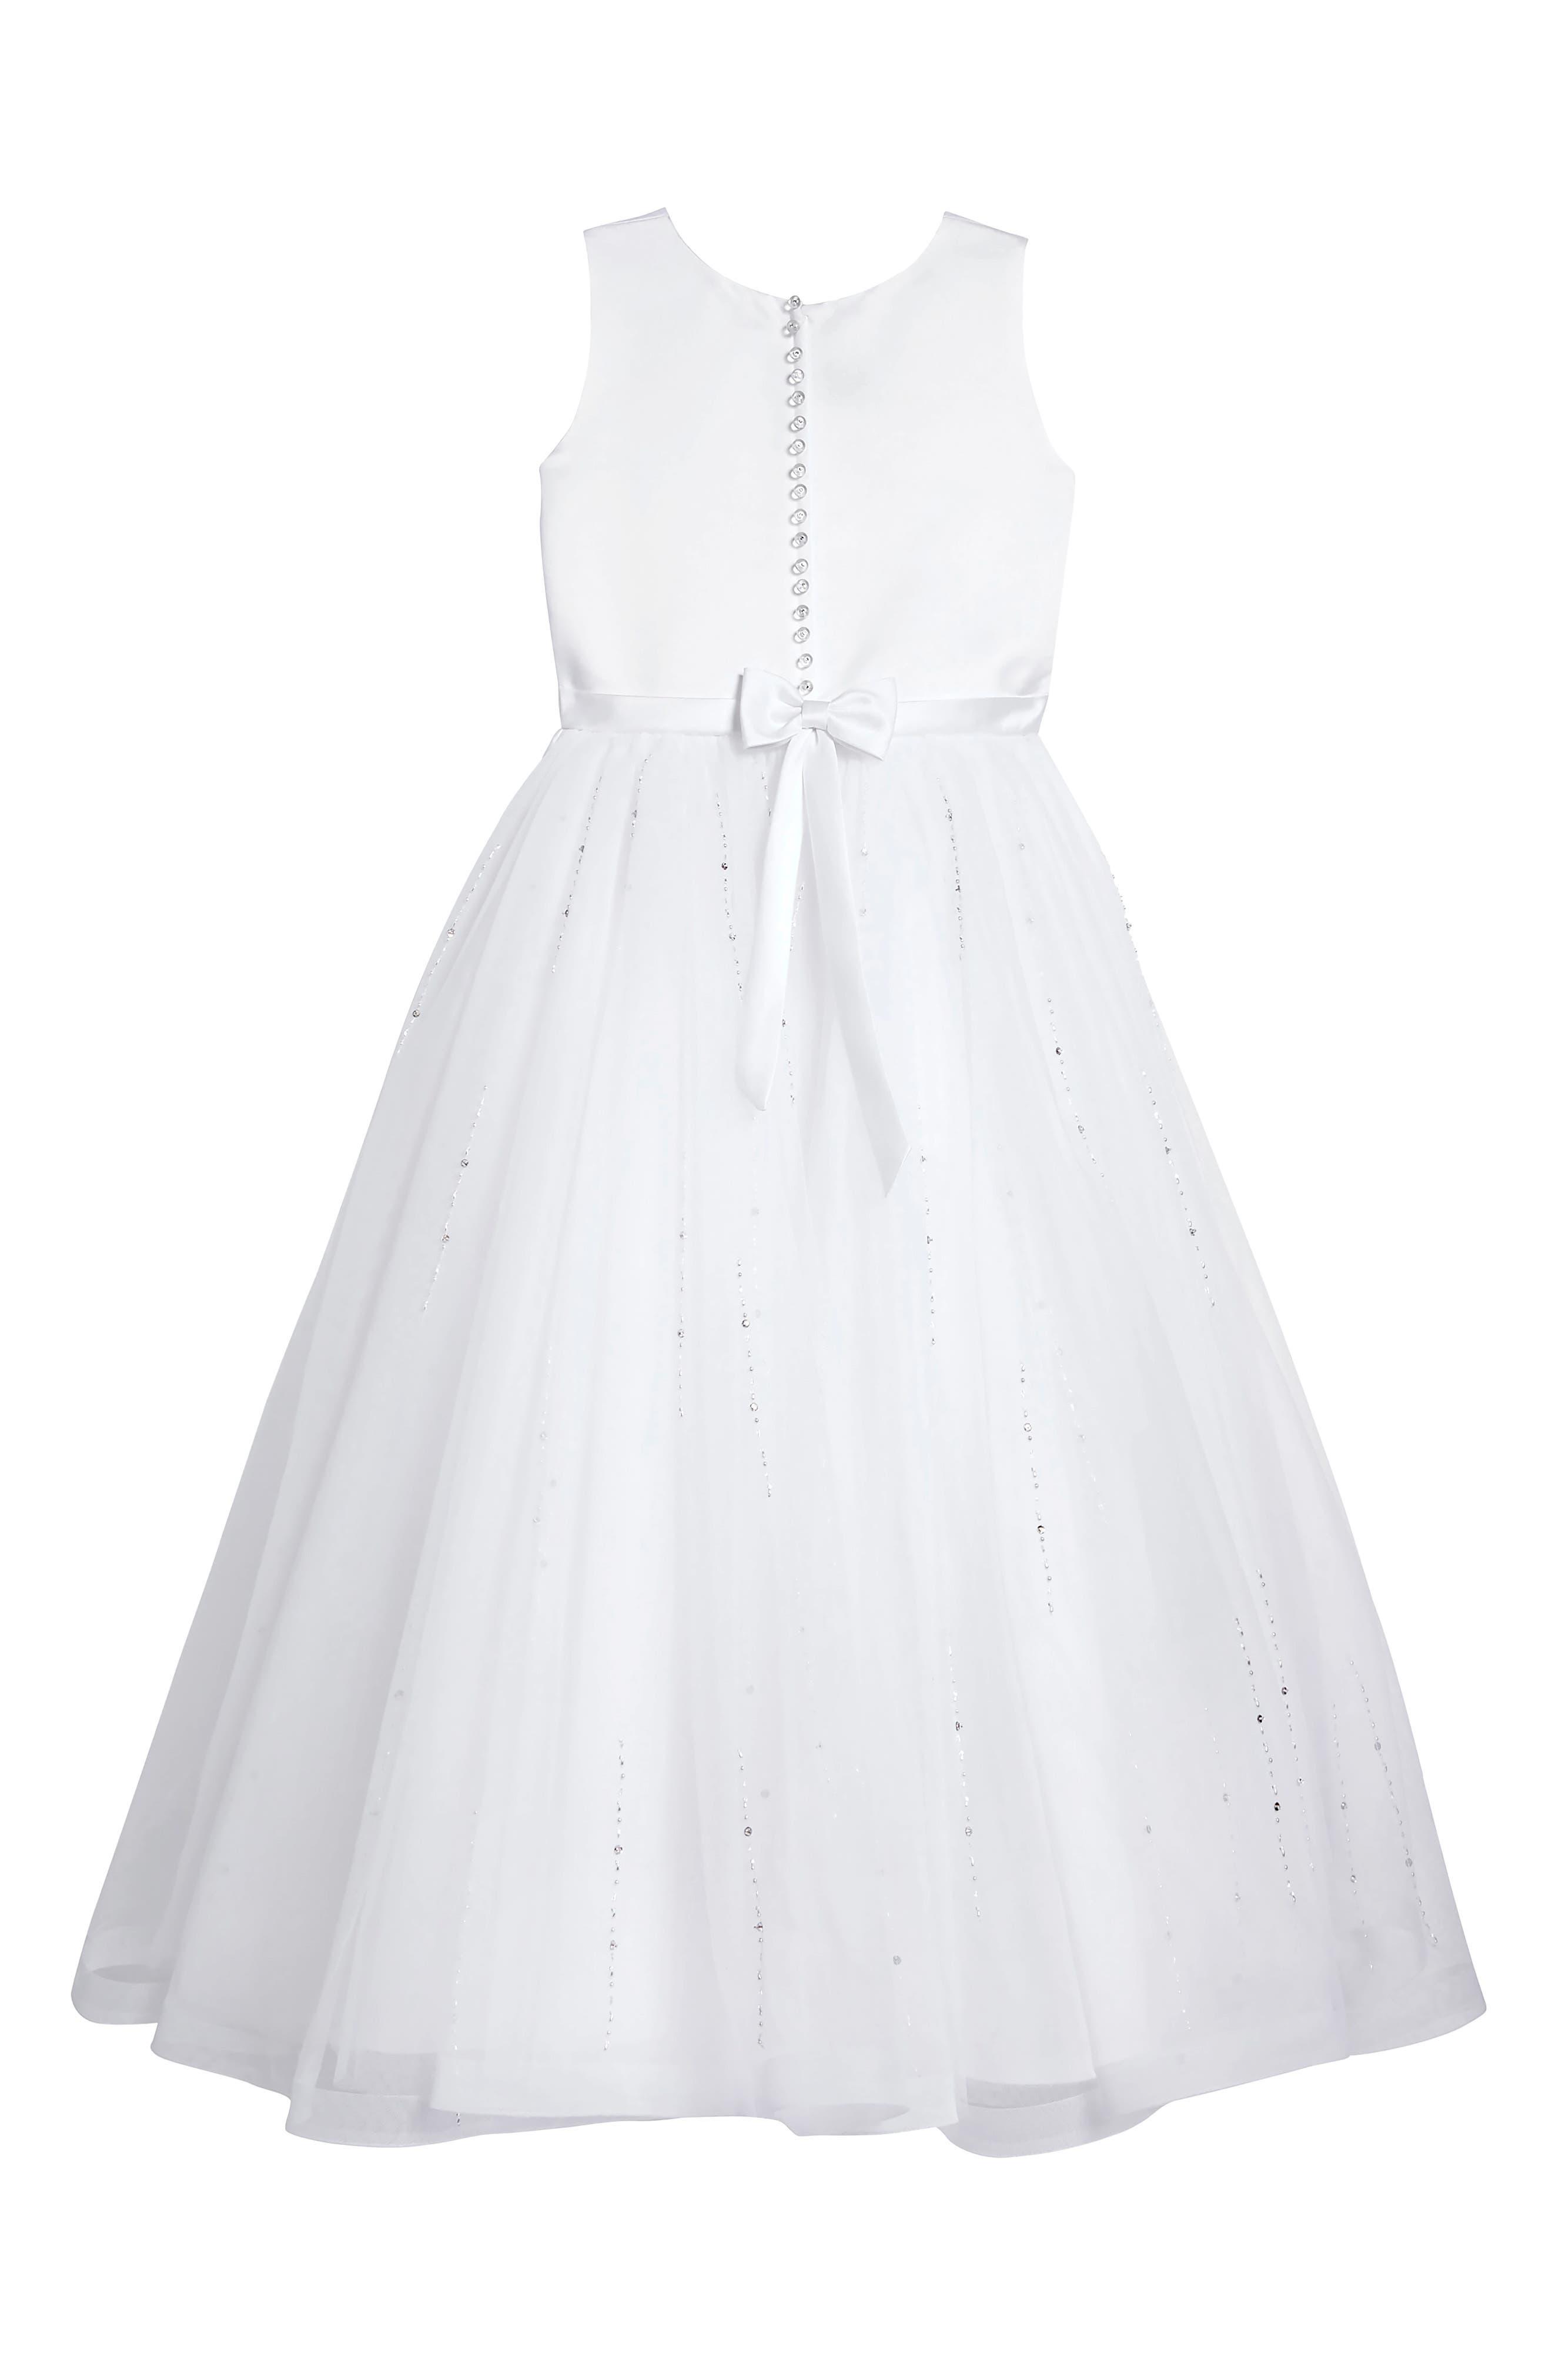 Satin & Tulle First Communion Dress,                             Alternate thumbnail 2, color,                             100